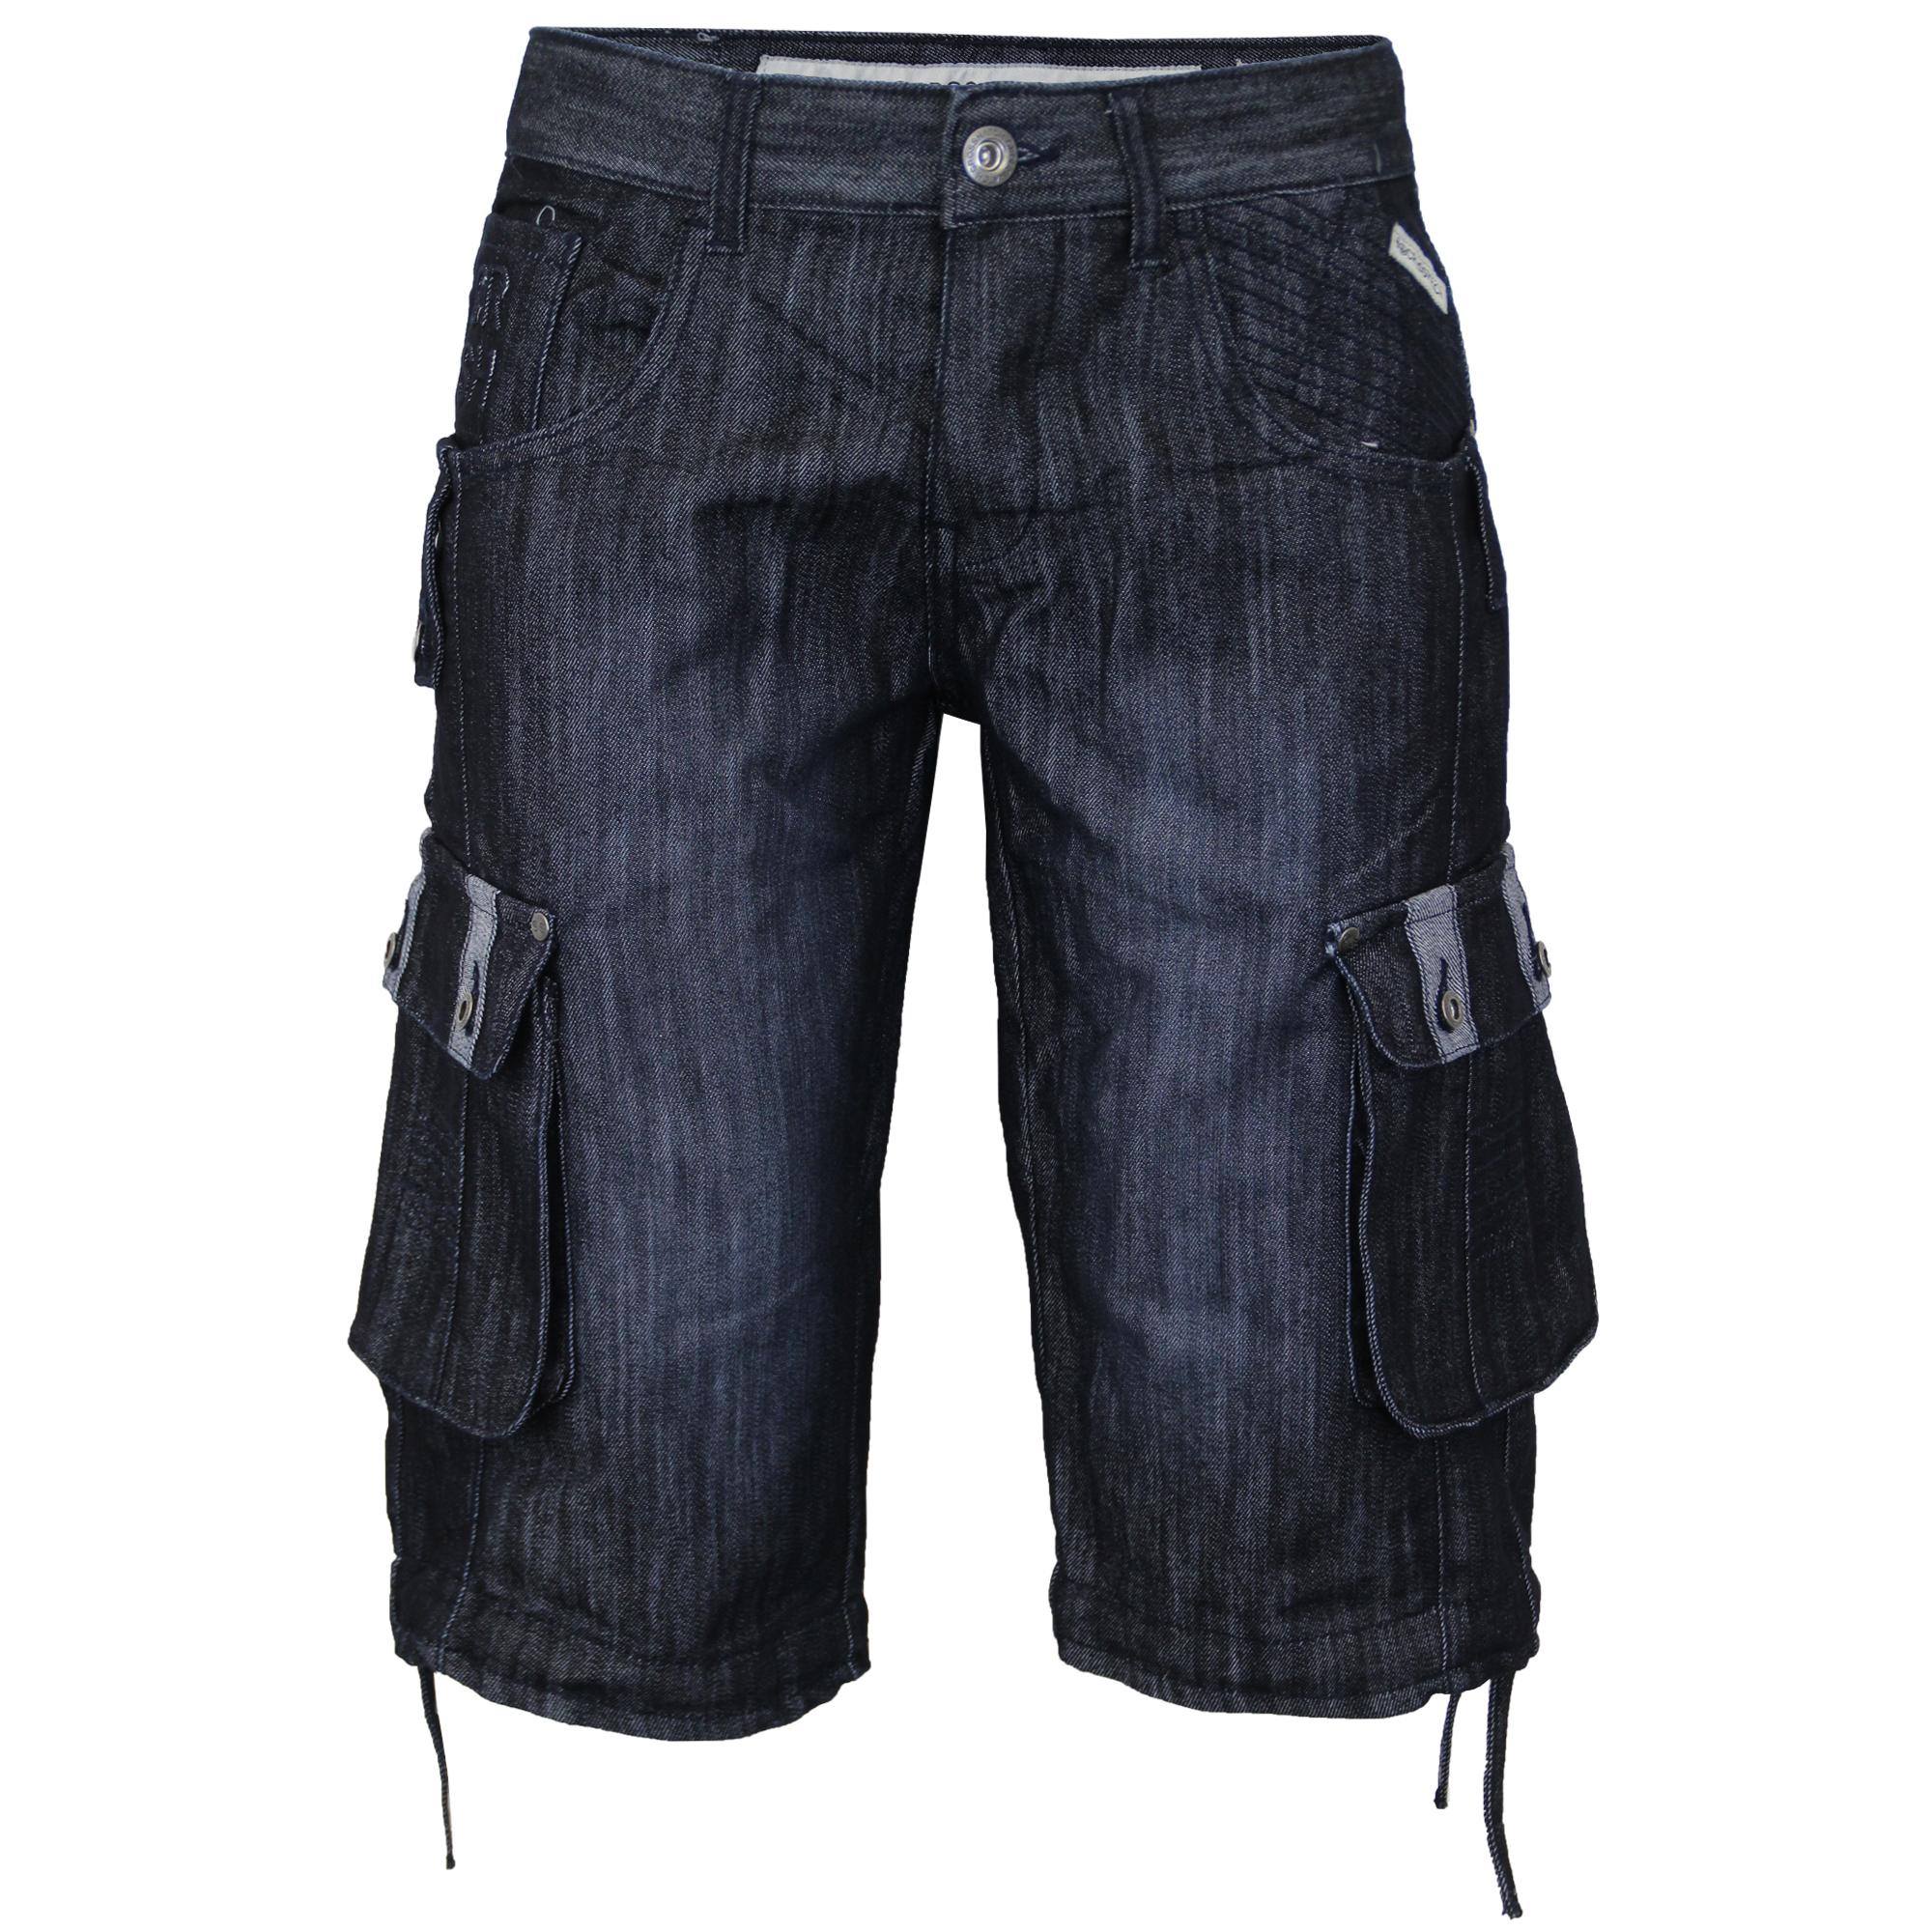 Mens-Denim-Knee-Length-Combat-Shorts-By-Crosshatch thumbnail 5